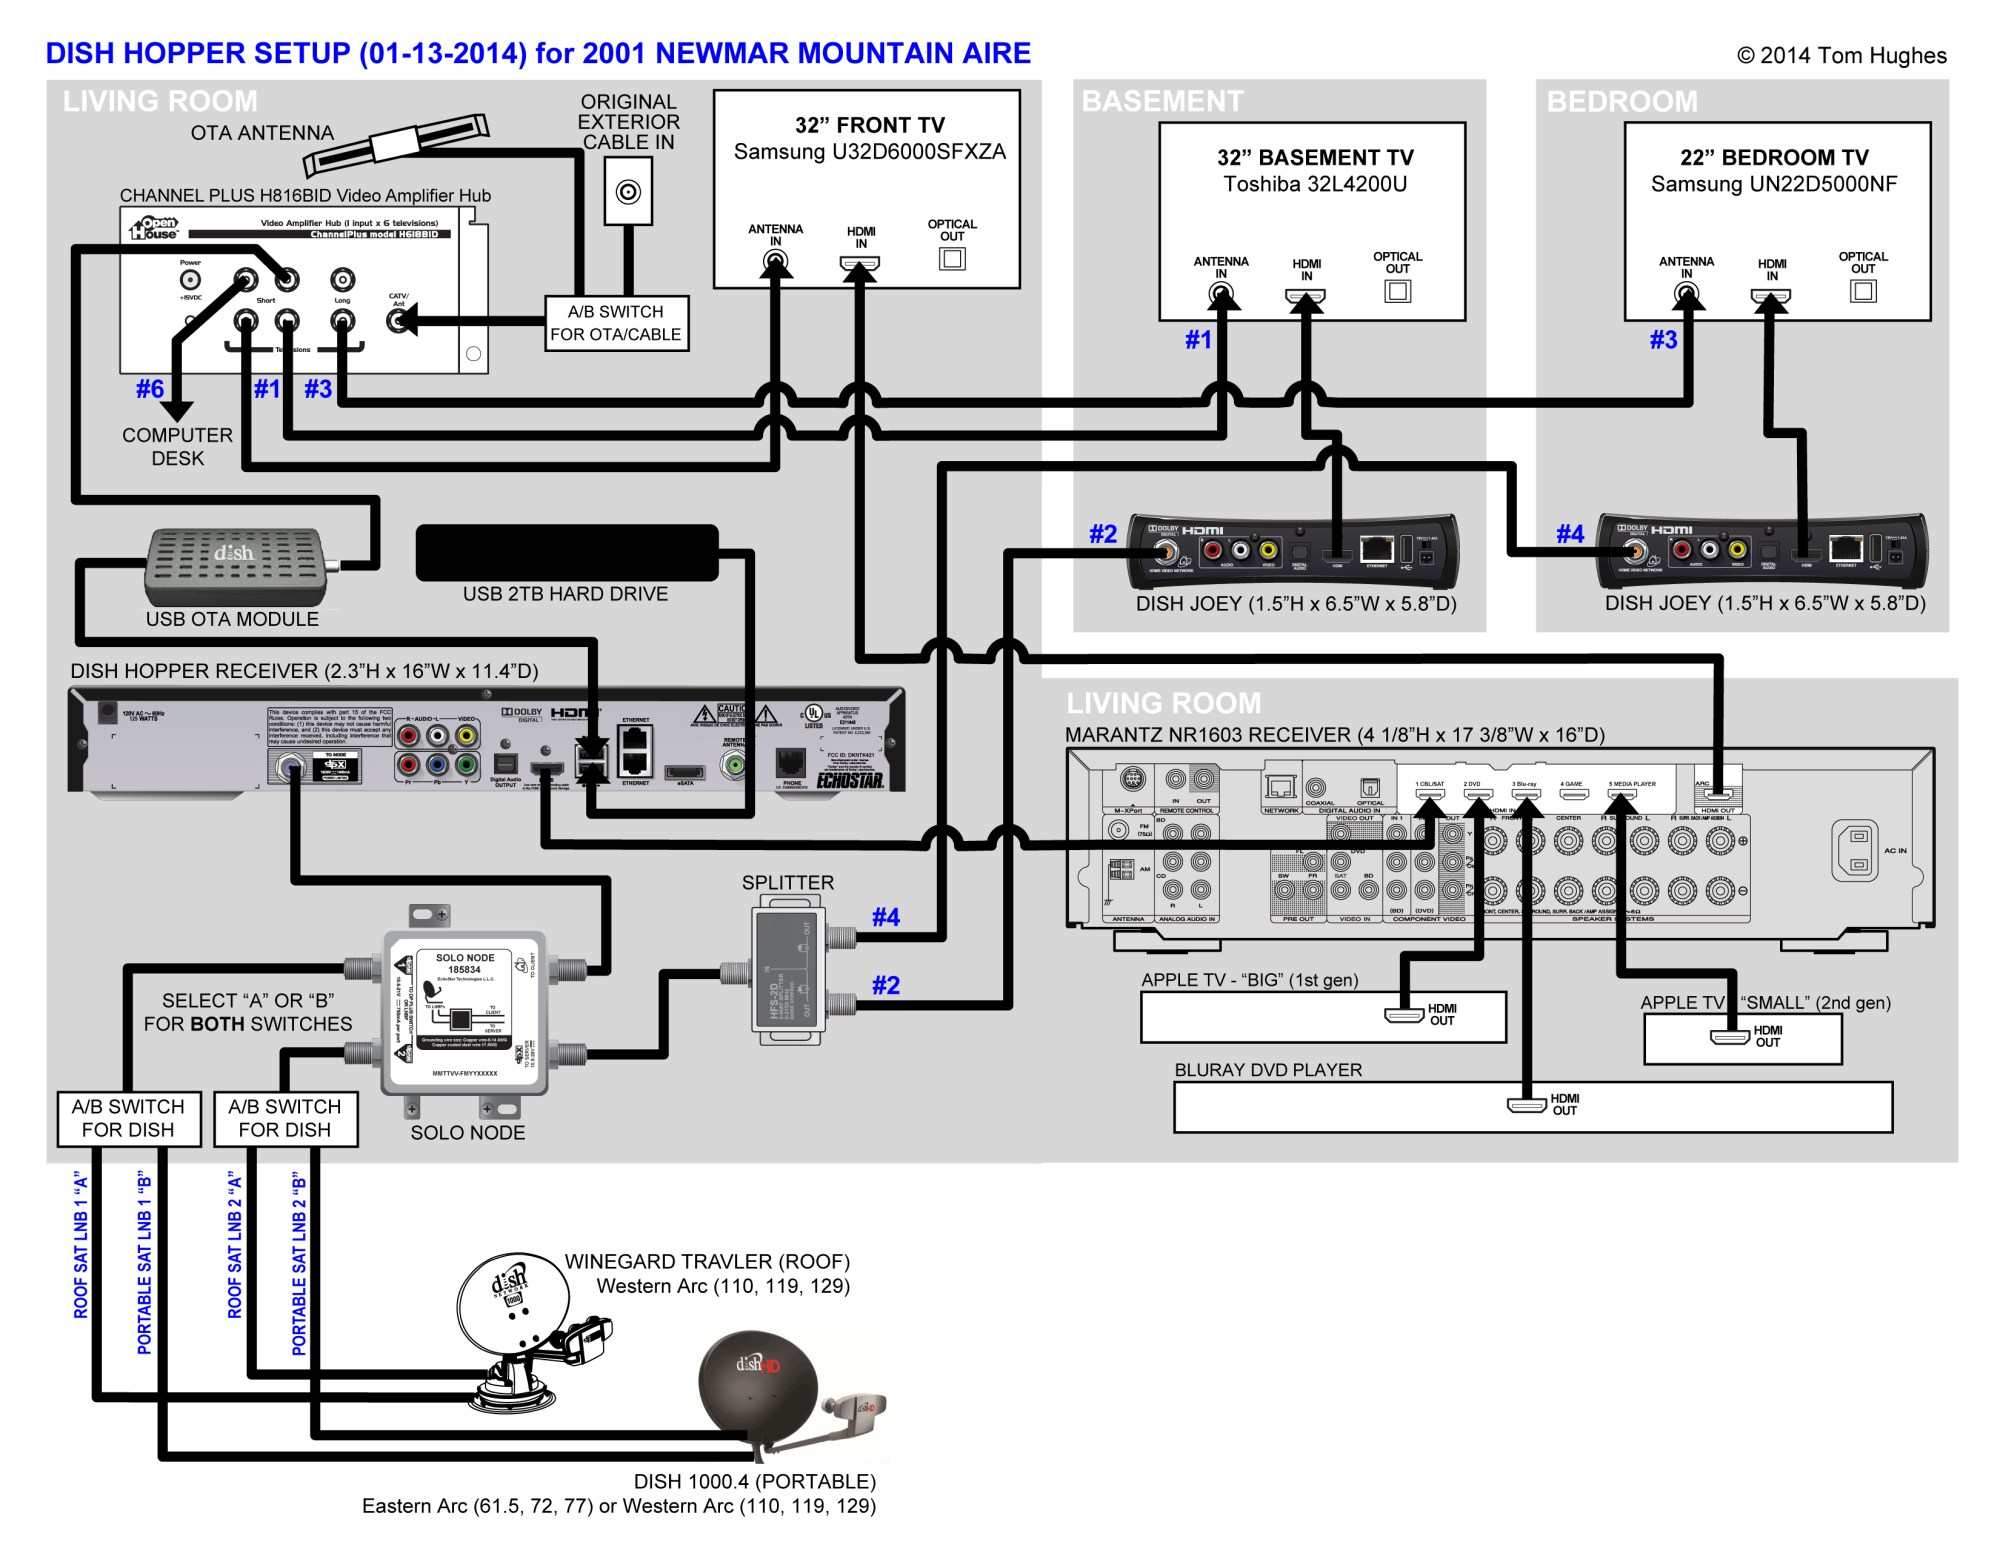 hight resolution of dish vip 222k wiring diagram wiring diagramdish vip 222 wiring diagram 15